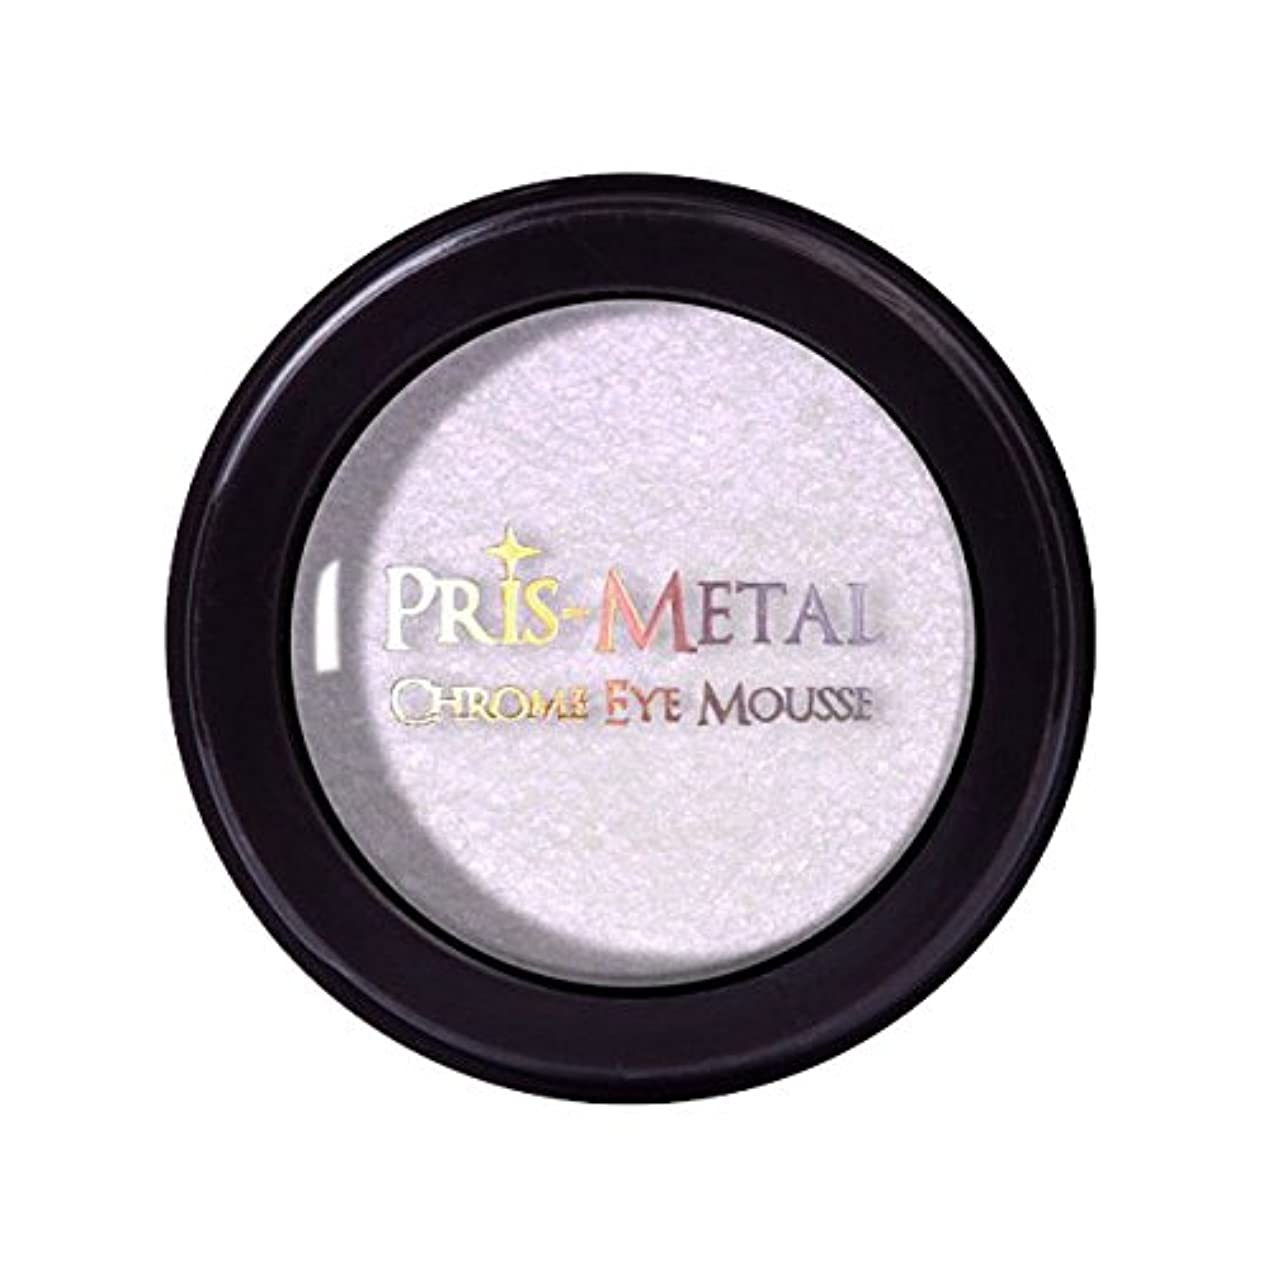 脈拍買収始めるJ. CAT BEAUTY Pris-Metal Chrome Eye Mousse - Pinky Promise (並行輸入品)